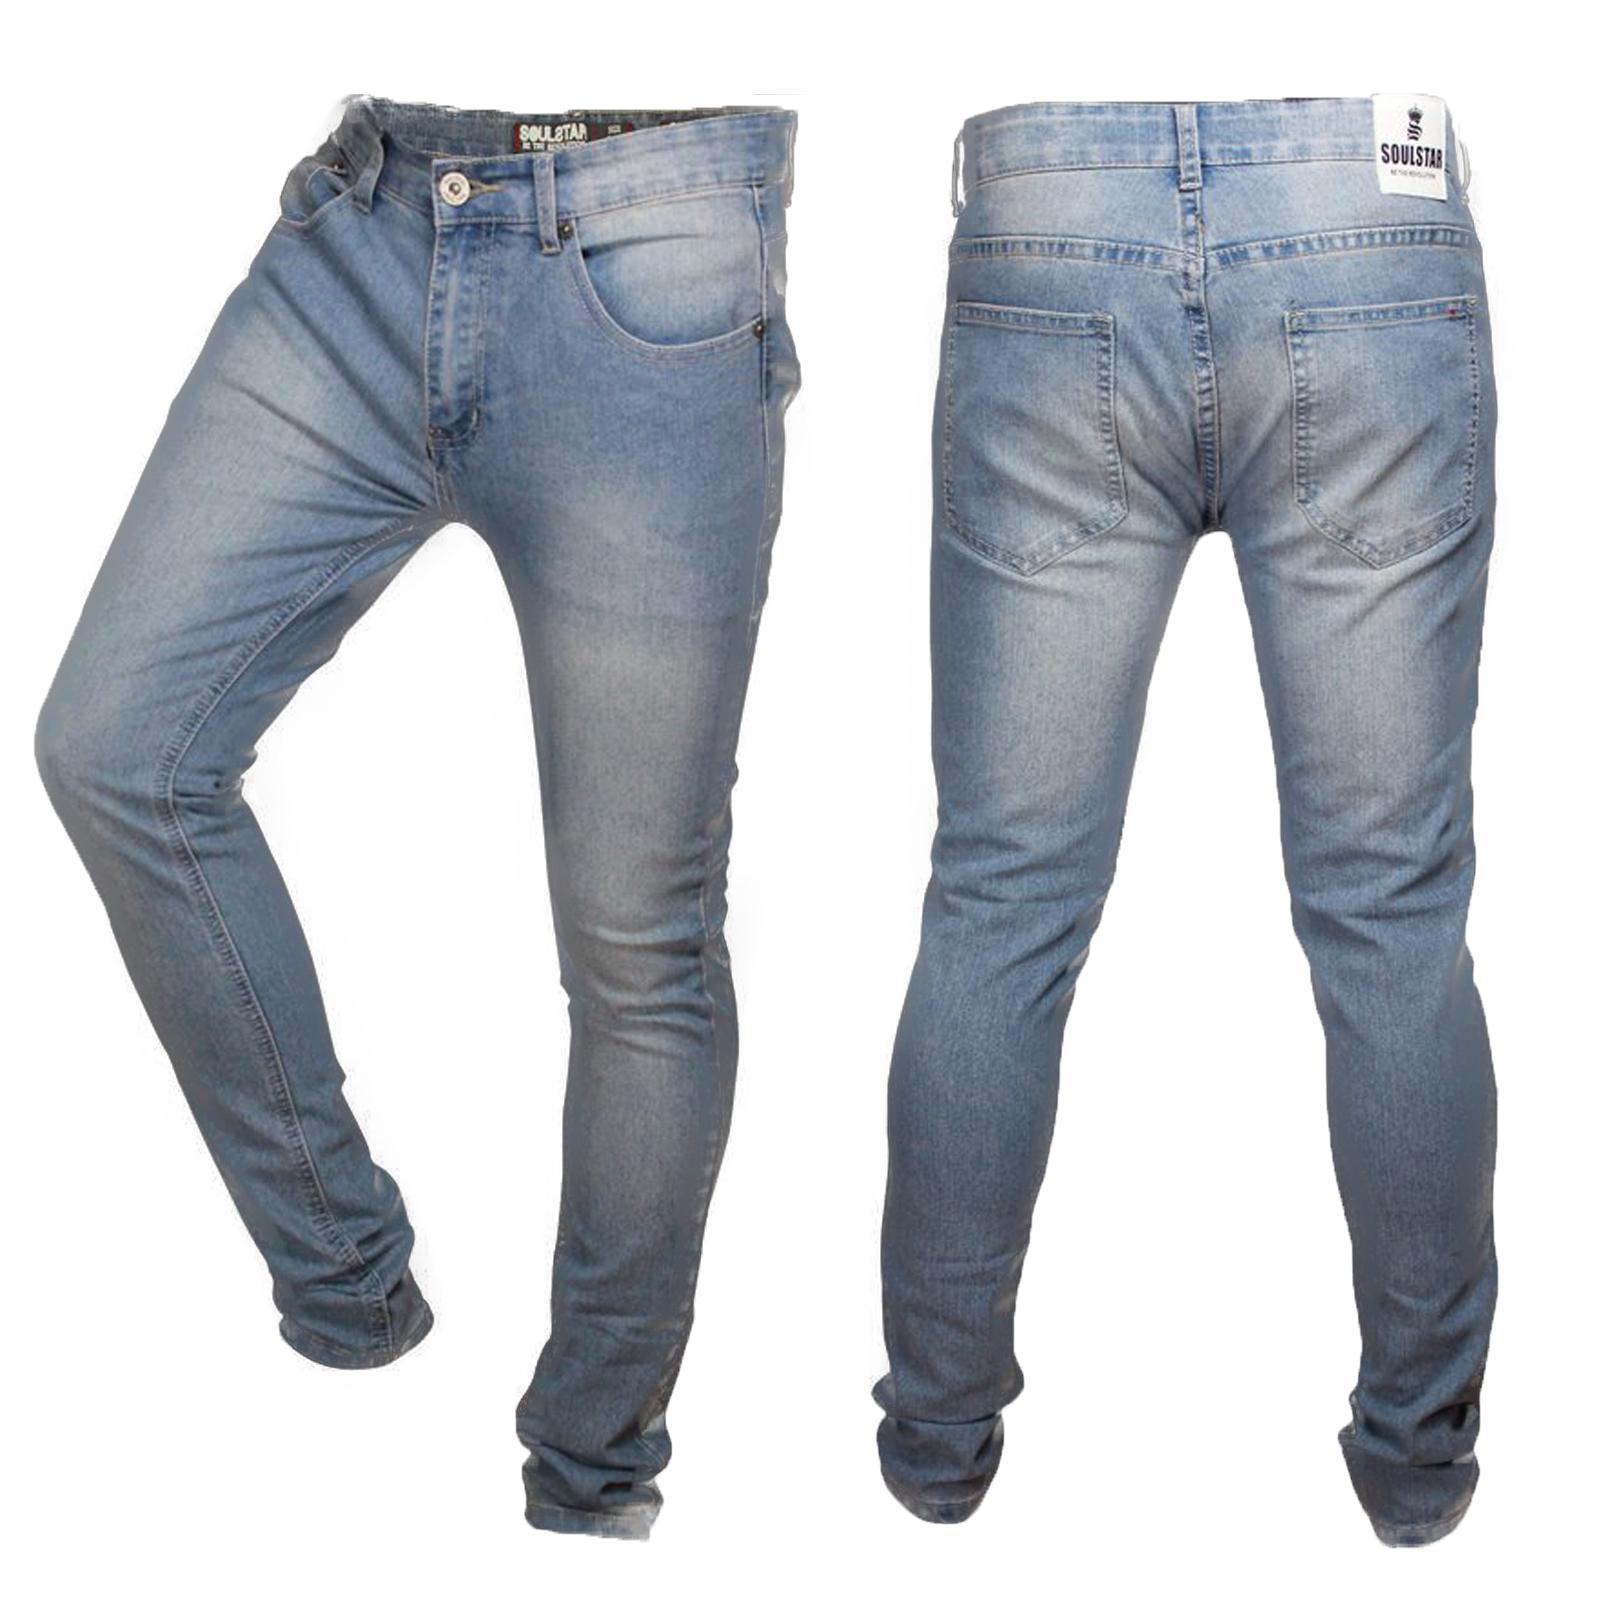 Soulstar deo homme skinny nouveau multi ripped stretch coupe slim denim pantalon